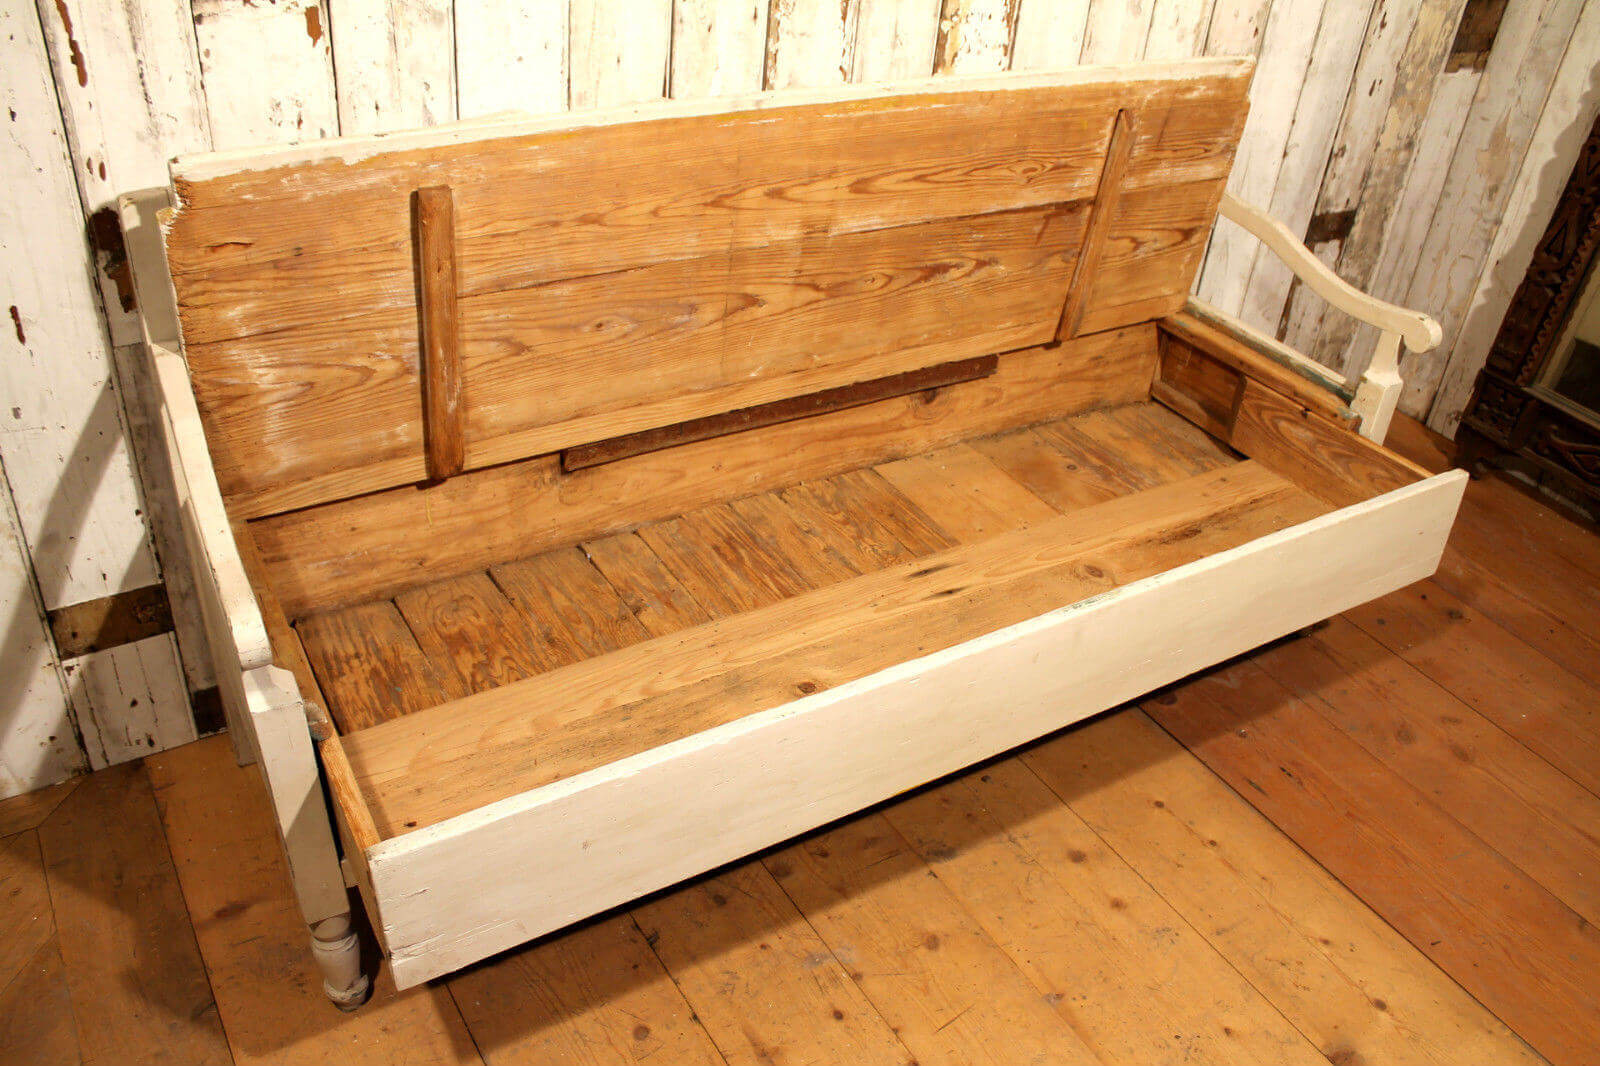 Original 19th Century European Hand Crafted Pine Box Bench